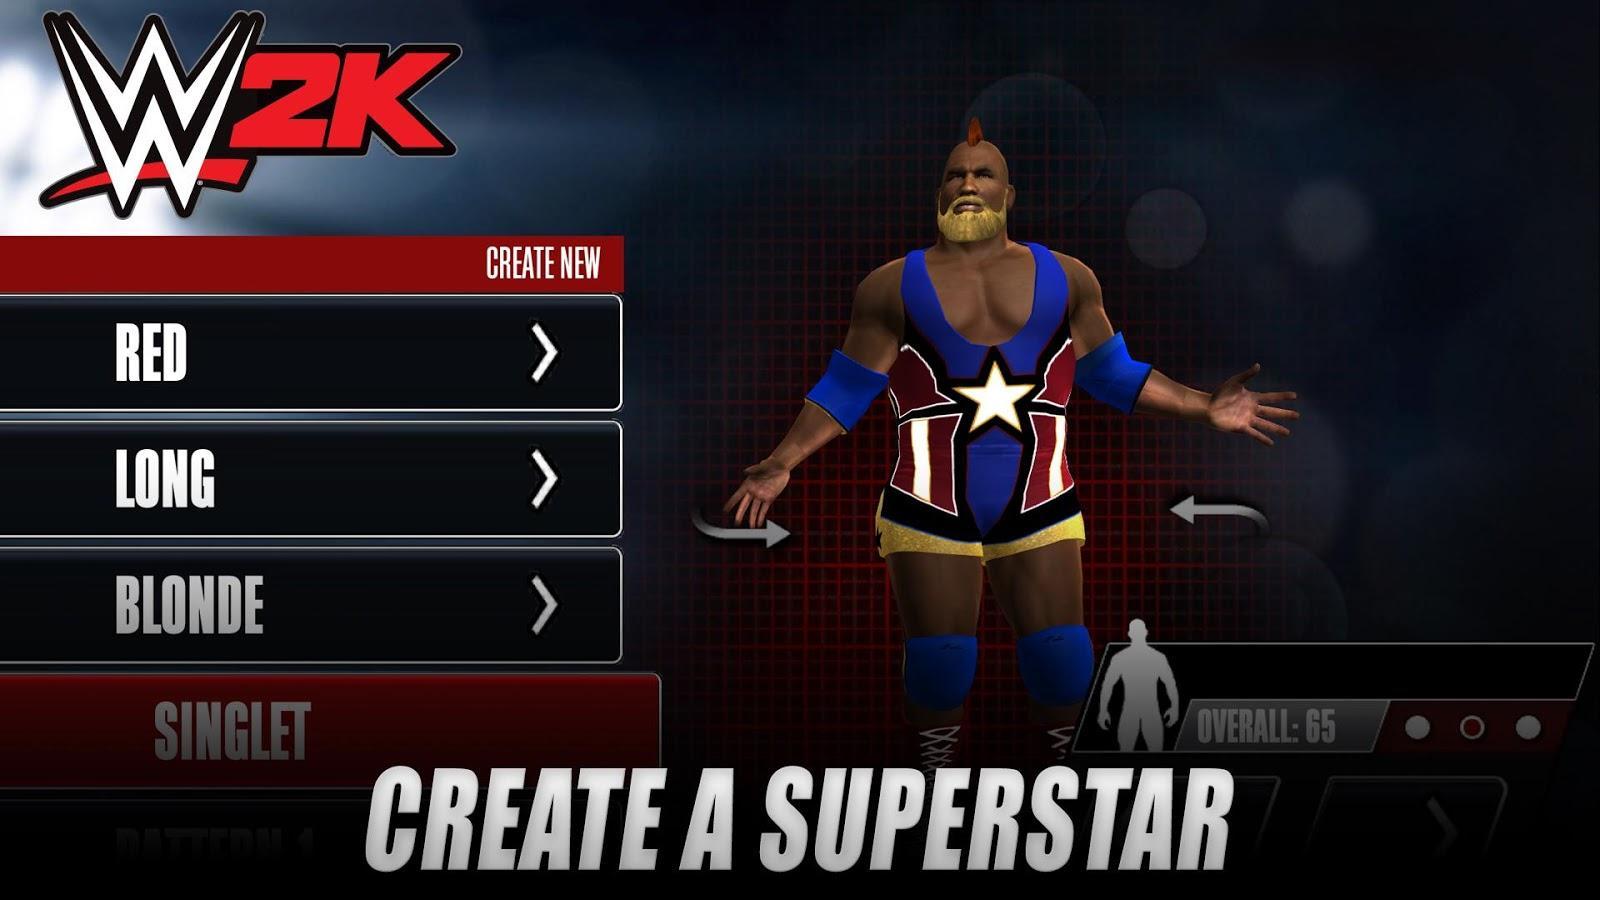 WWE 2K (MOD APK, Paid/Unlocked) v1.1.8117 3